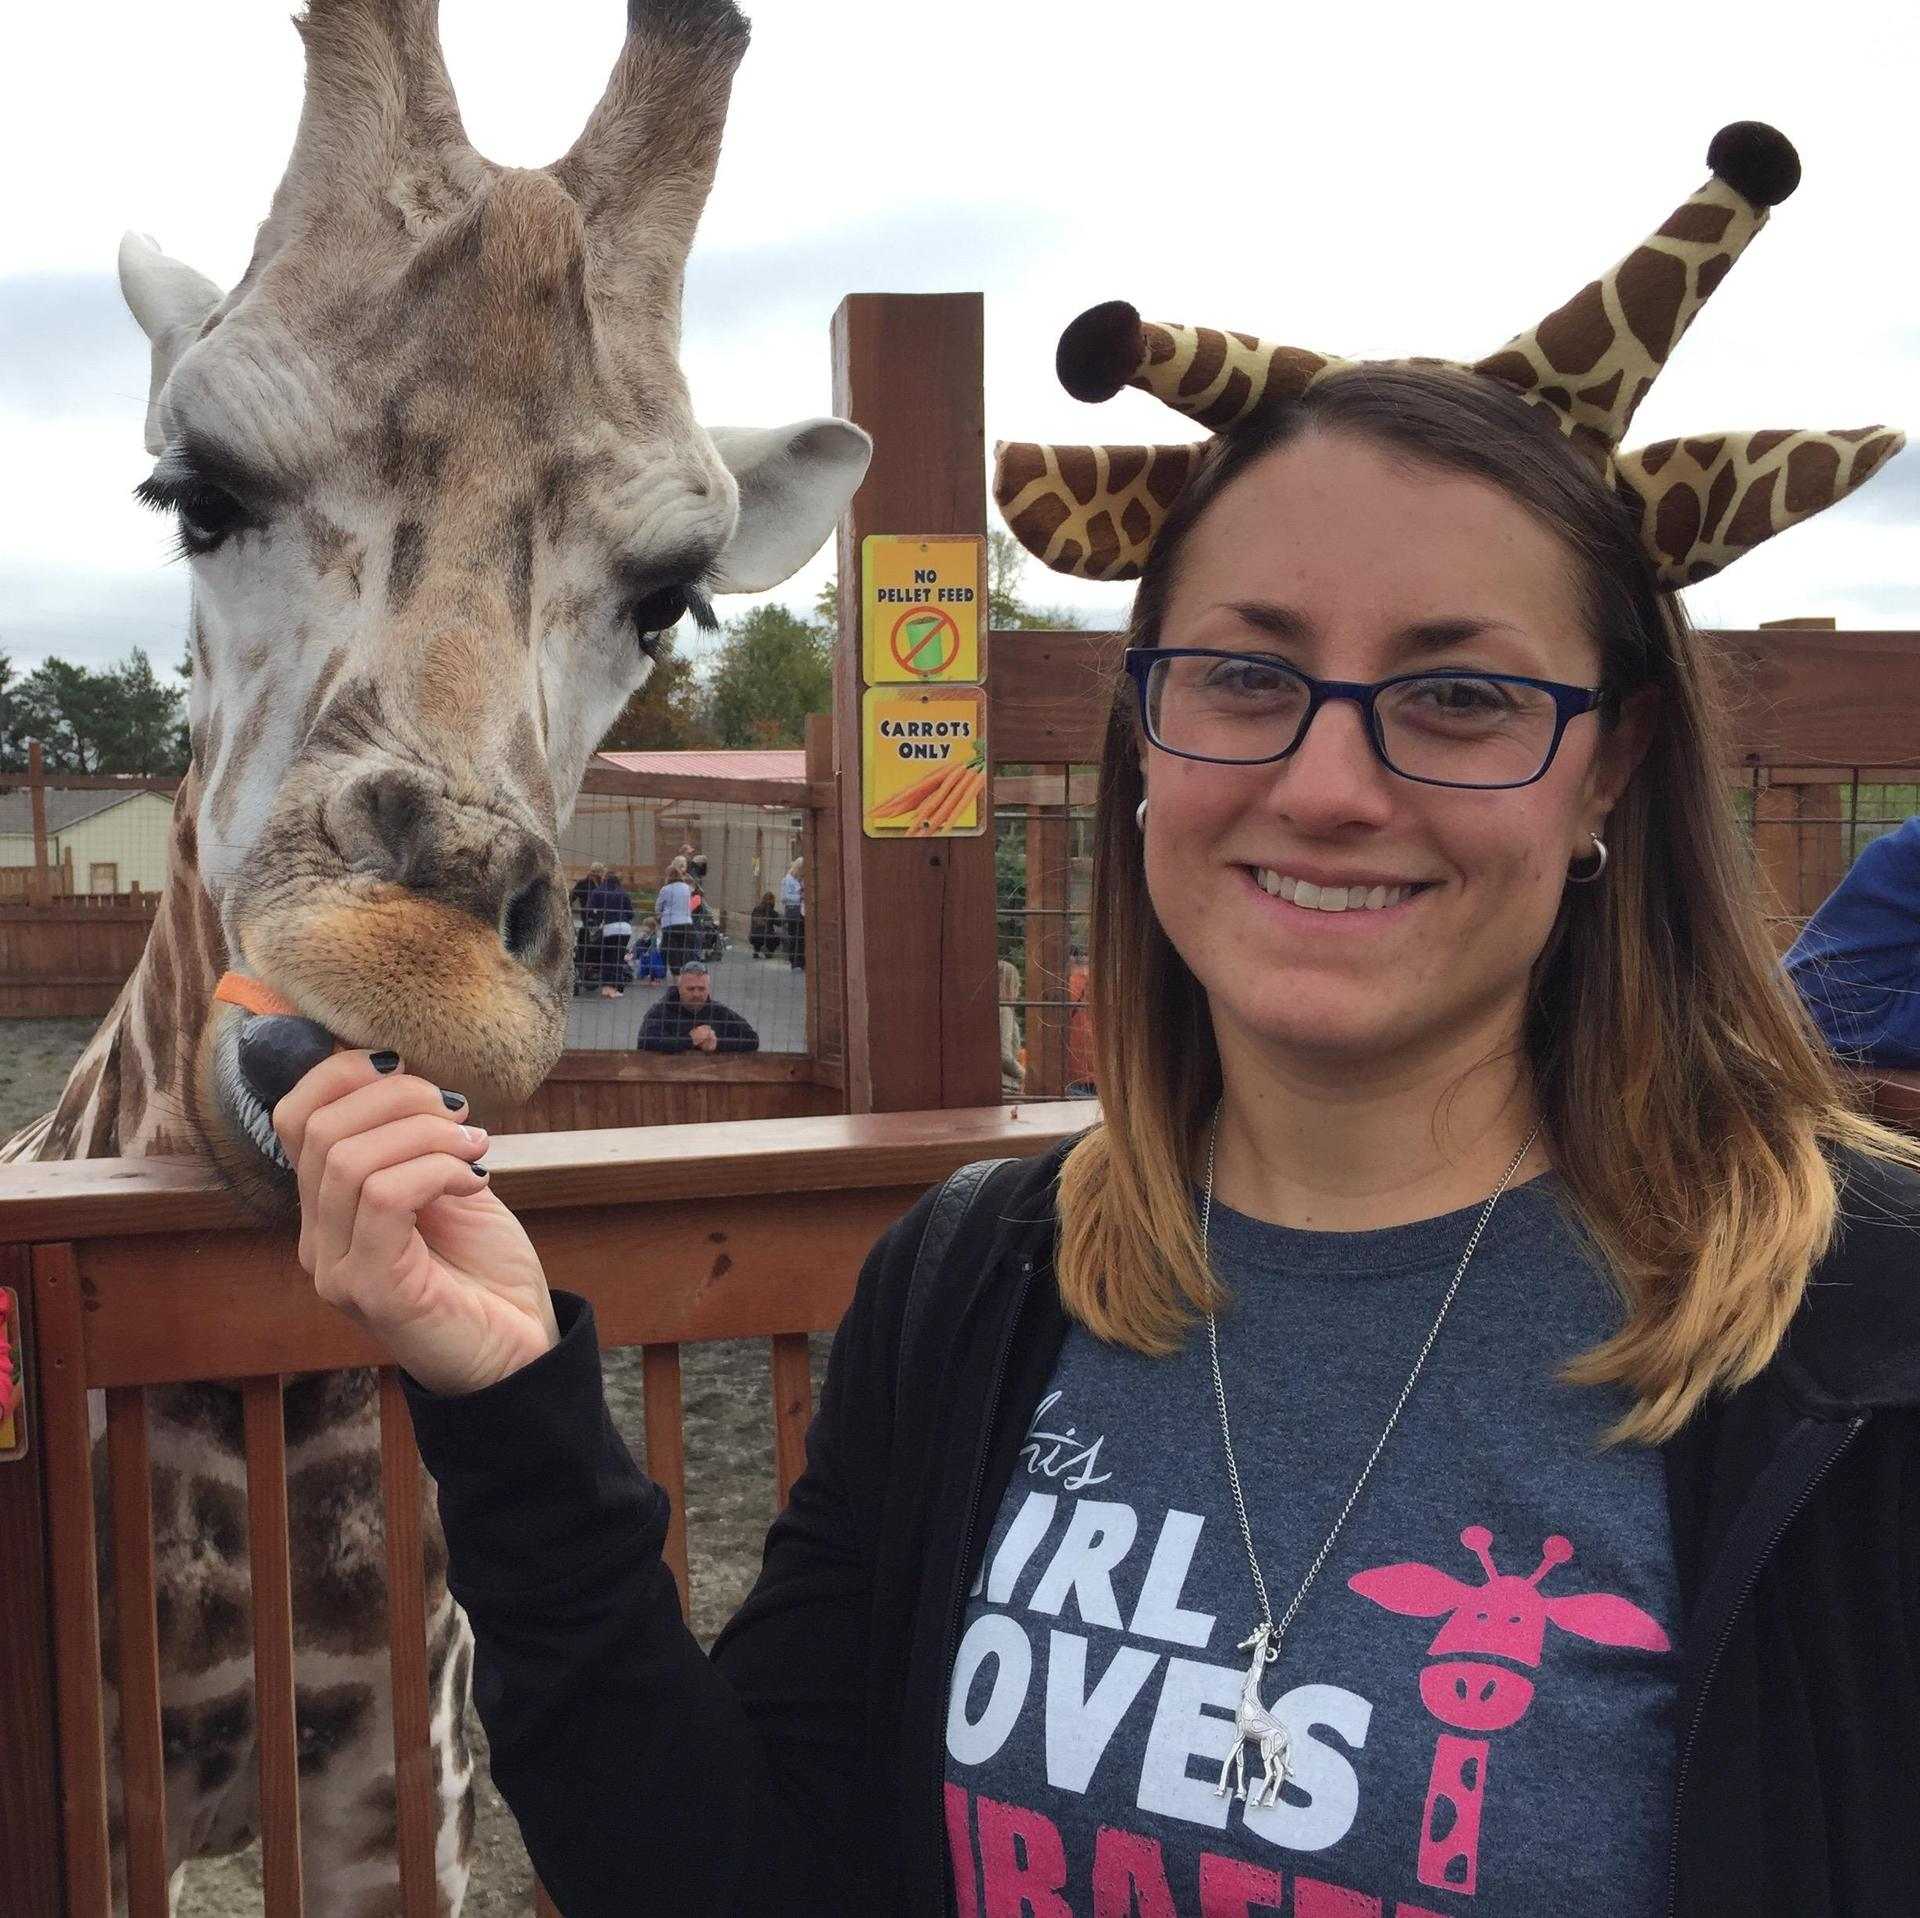 Ms. Violette feeding a giraffe